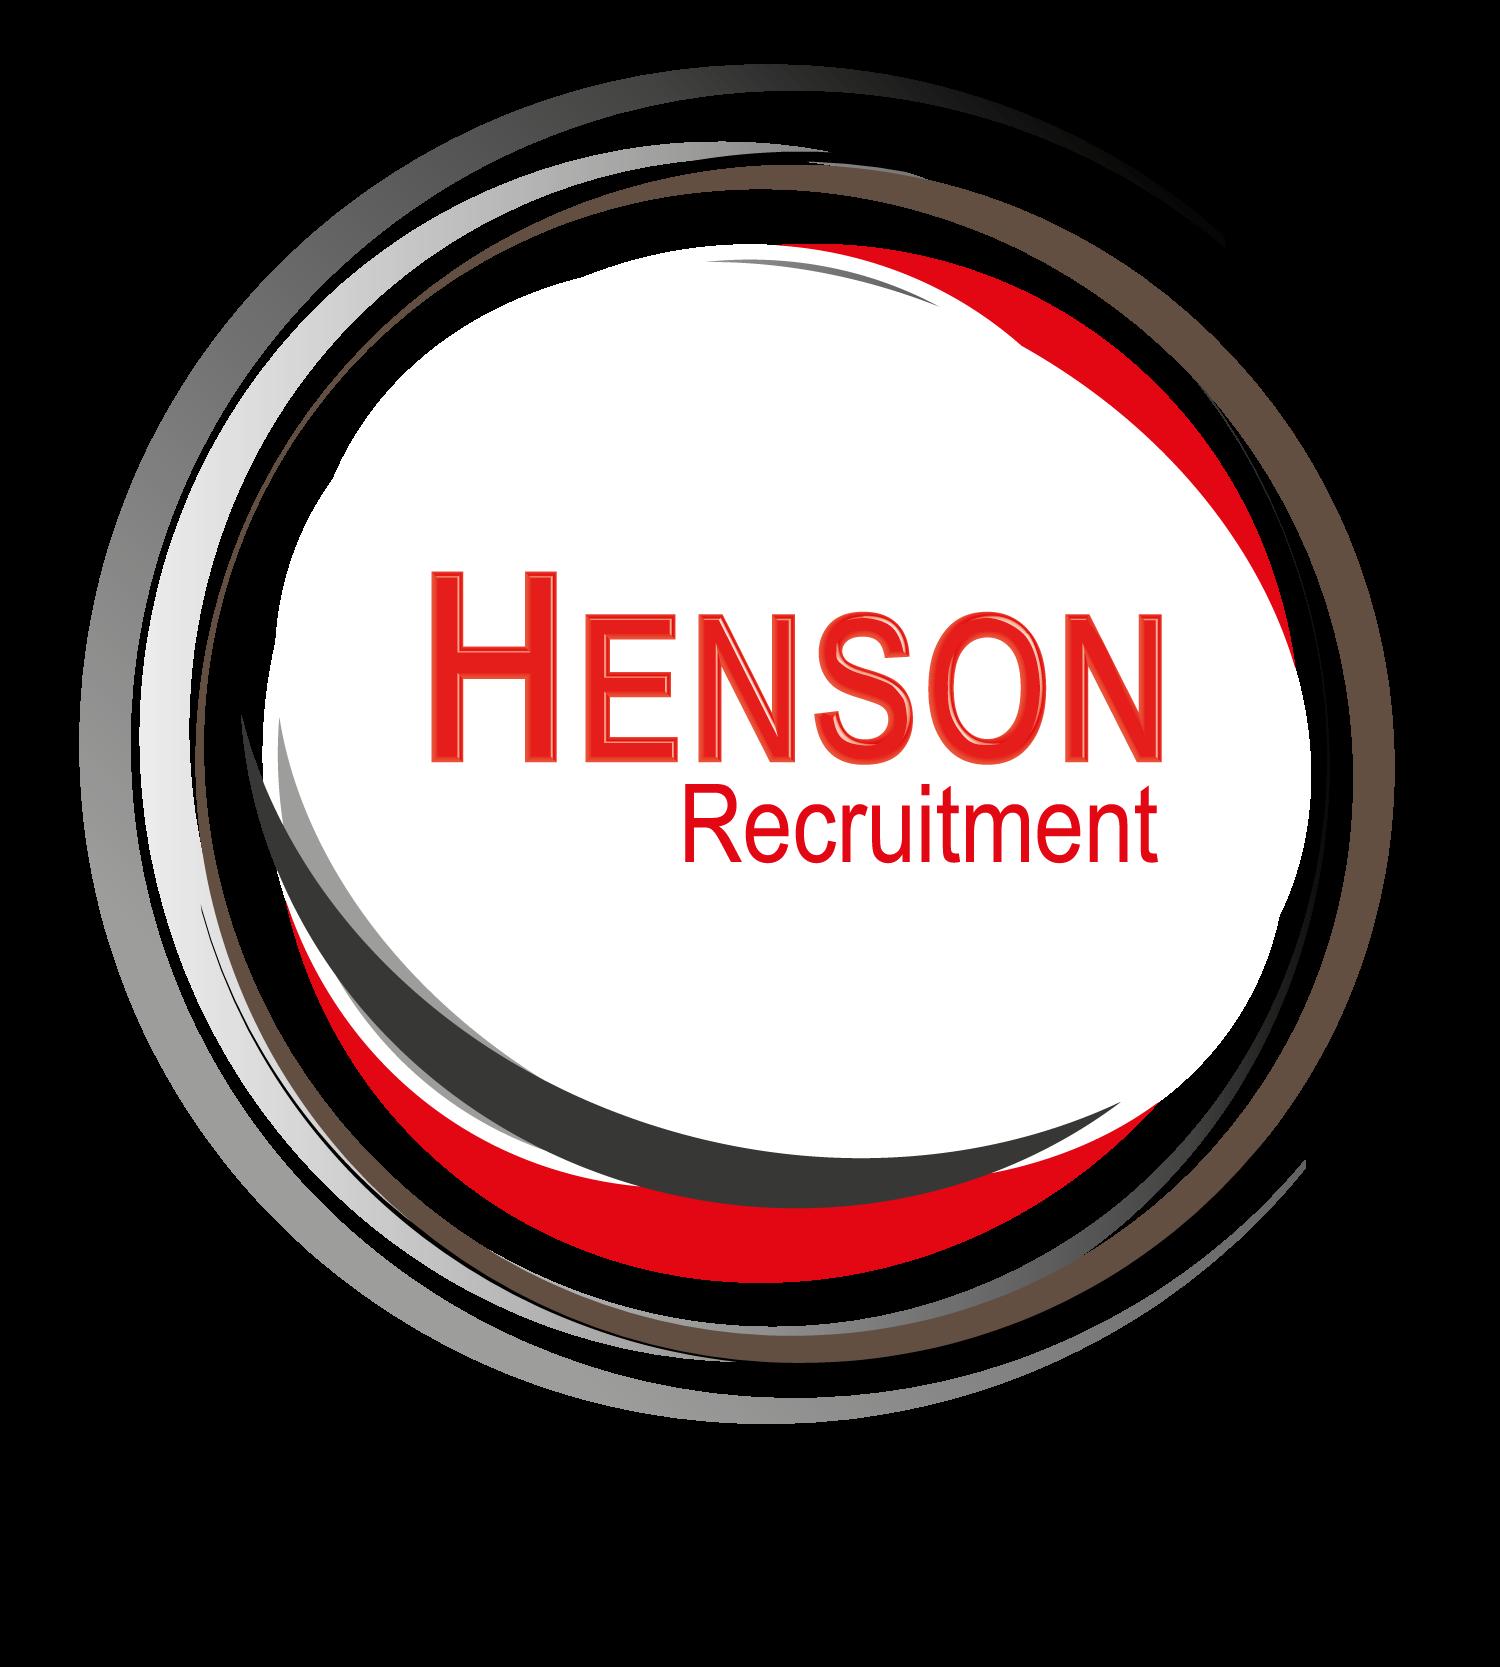 Henson Recruitment